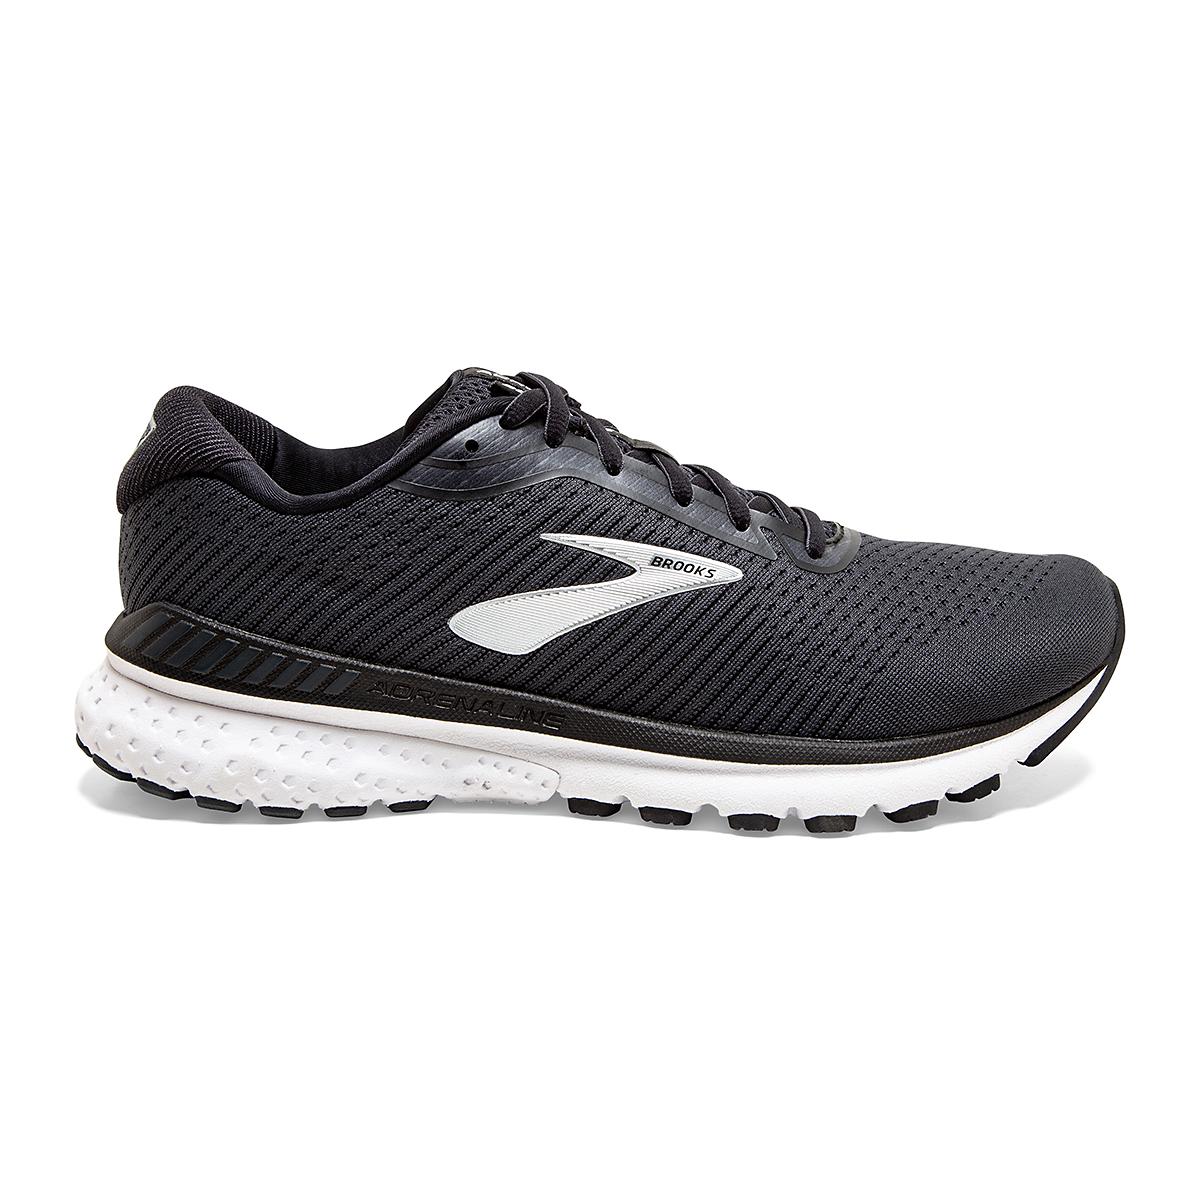 Men's Brooks Adrenaline GTS 20 Running Shoe - Color: Black/Grey/Ebony - Size: 7 - Width: Regular, Black/Grey/Ebony, large, image 1